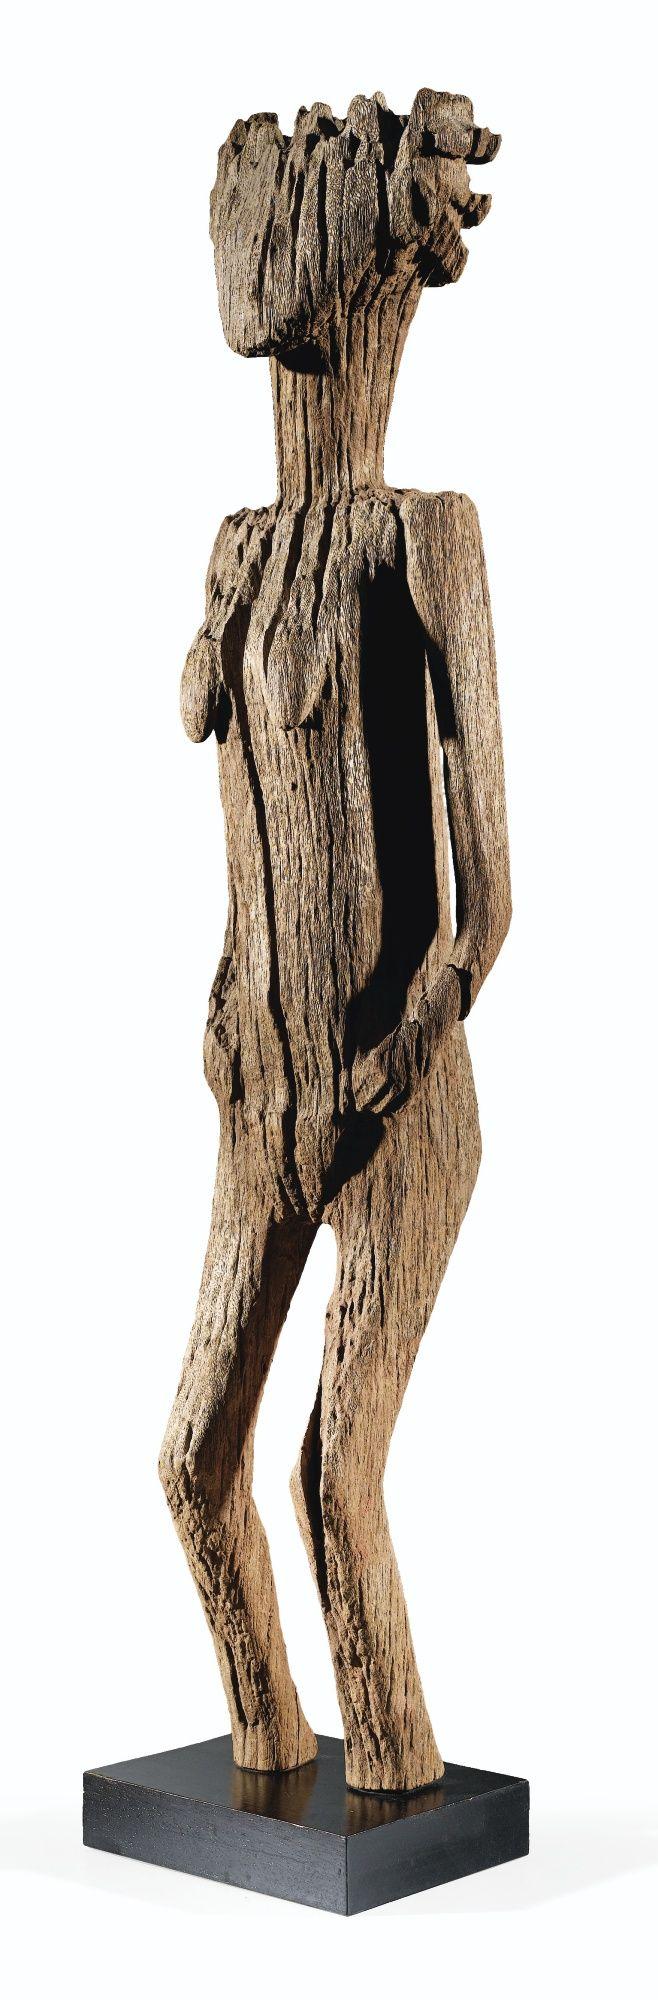 STATUE, SAKALAVA, MADAGASCAR SAKALAVA FIGURE, MADAGASCAR H. 106 cm COLLECTION FRANÇOISE ET JEAN CORLAY – ARTS D'AFRIQUE Sotheby's, Paris, 18 June 2013